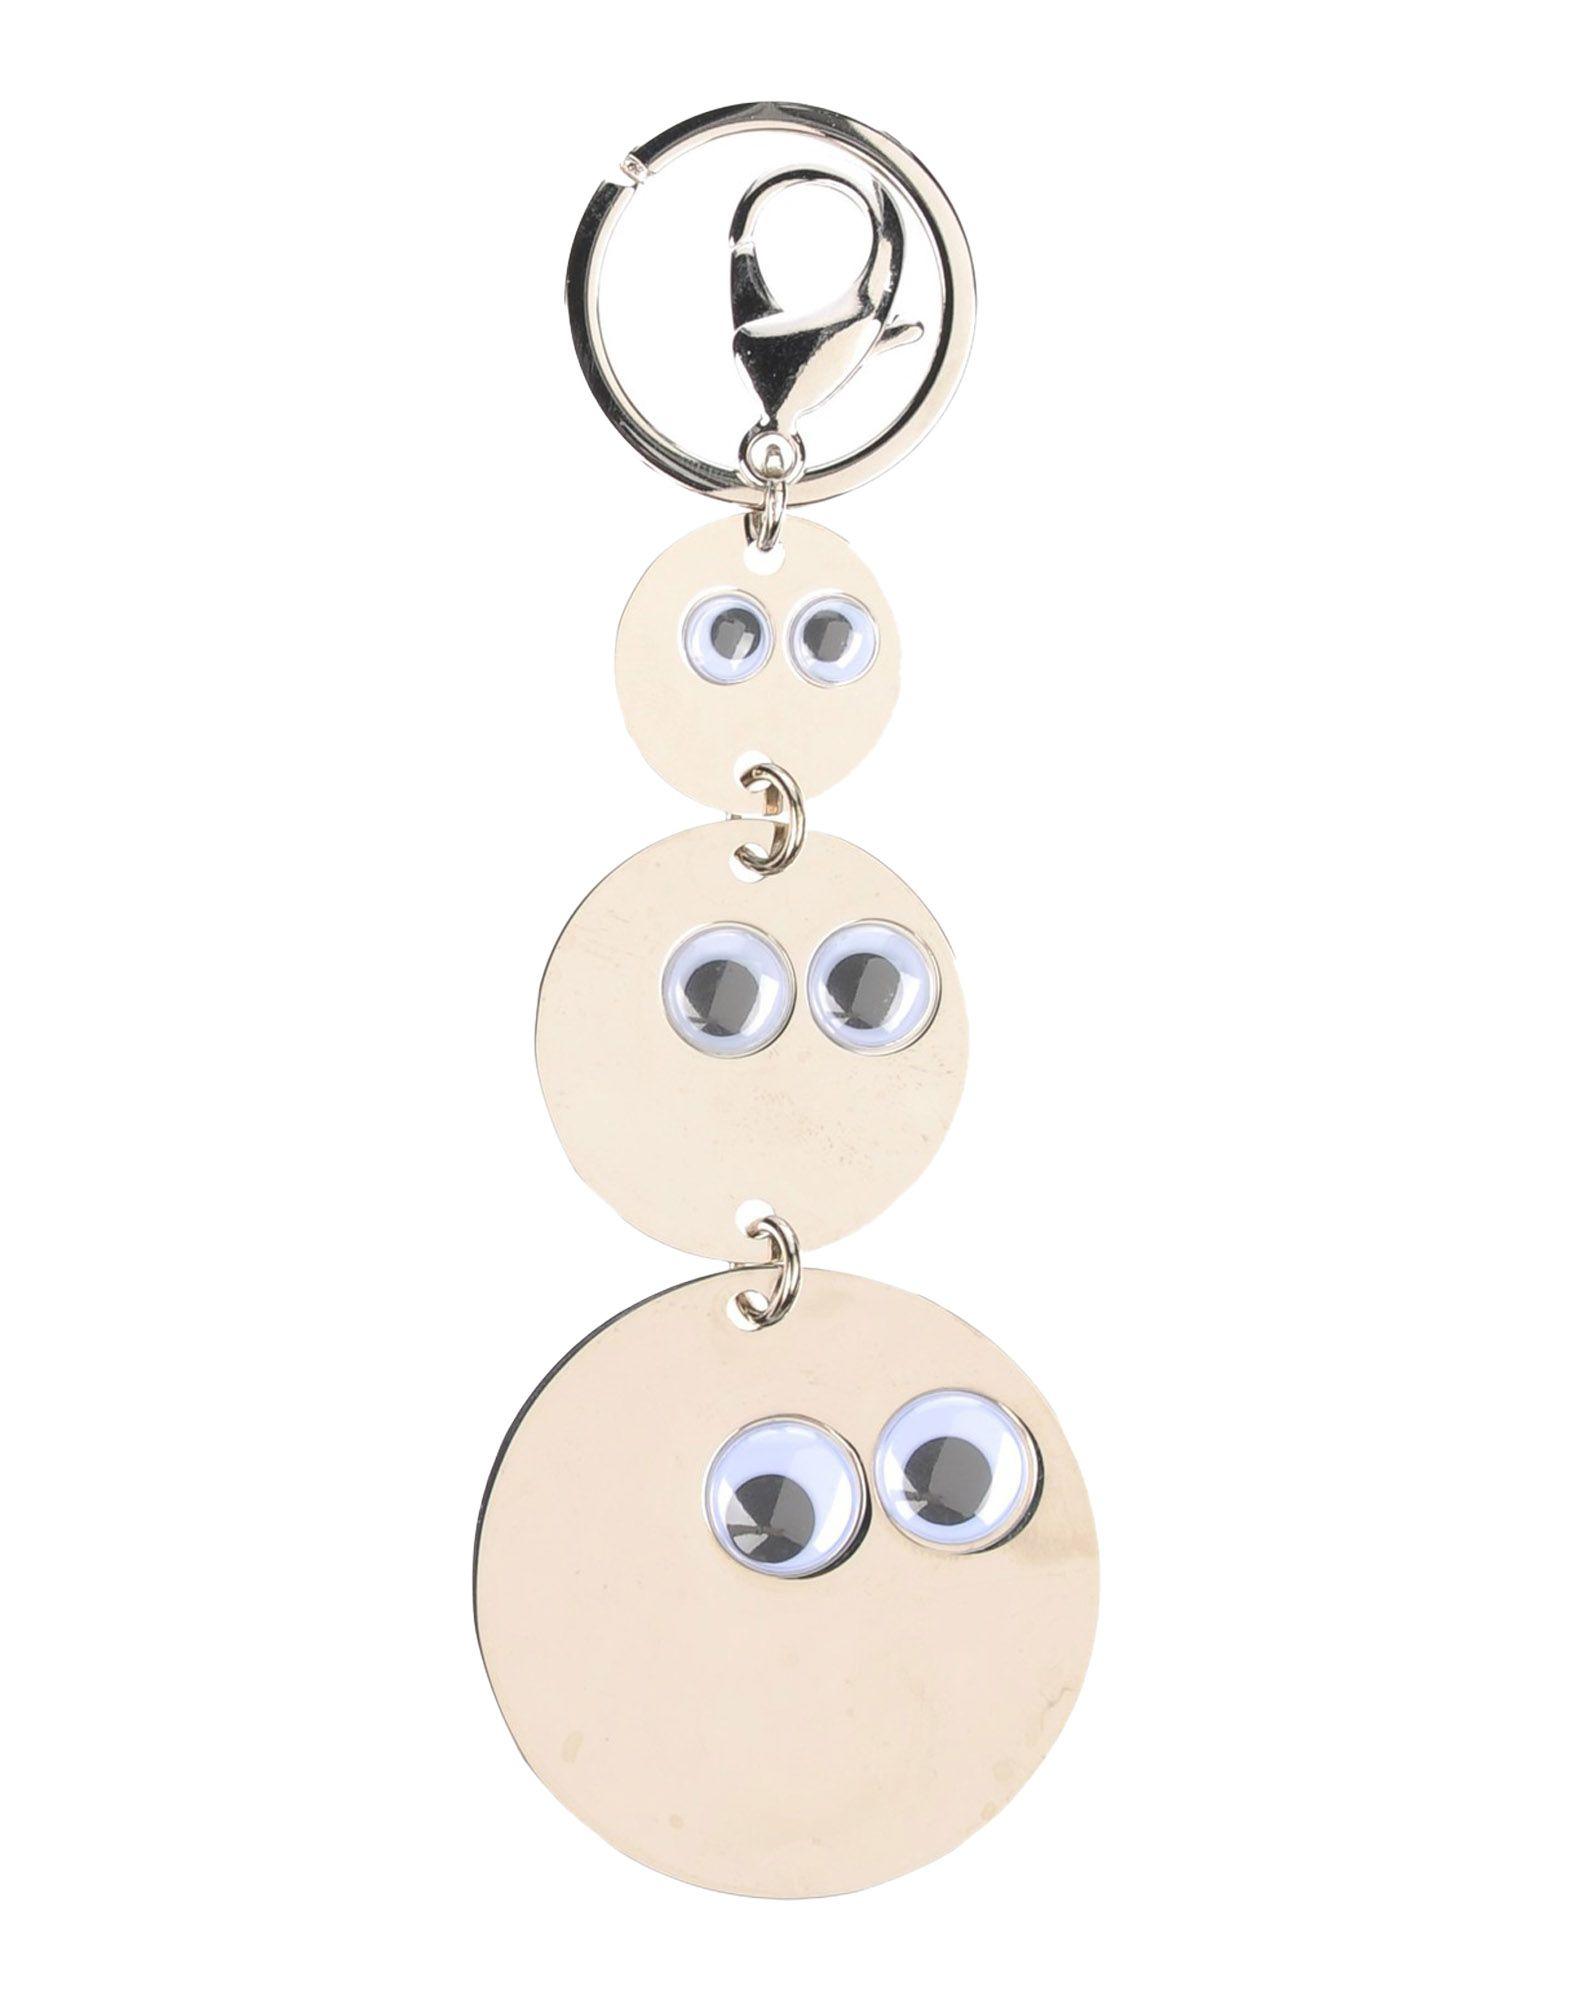 SOPHIE HULME Брелок для ключей брелок для ключей сердечко русские подарки брелок для ключей сердечко